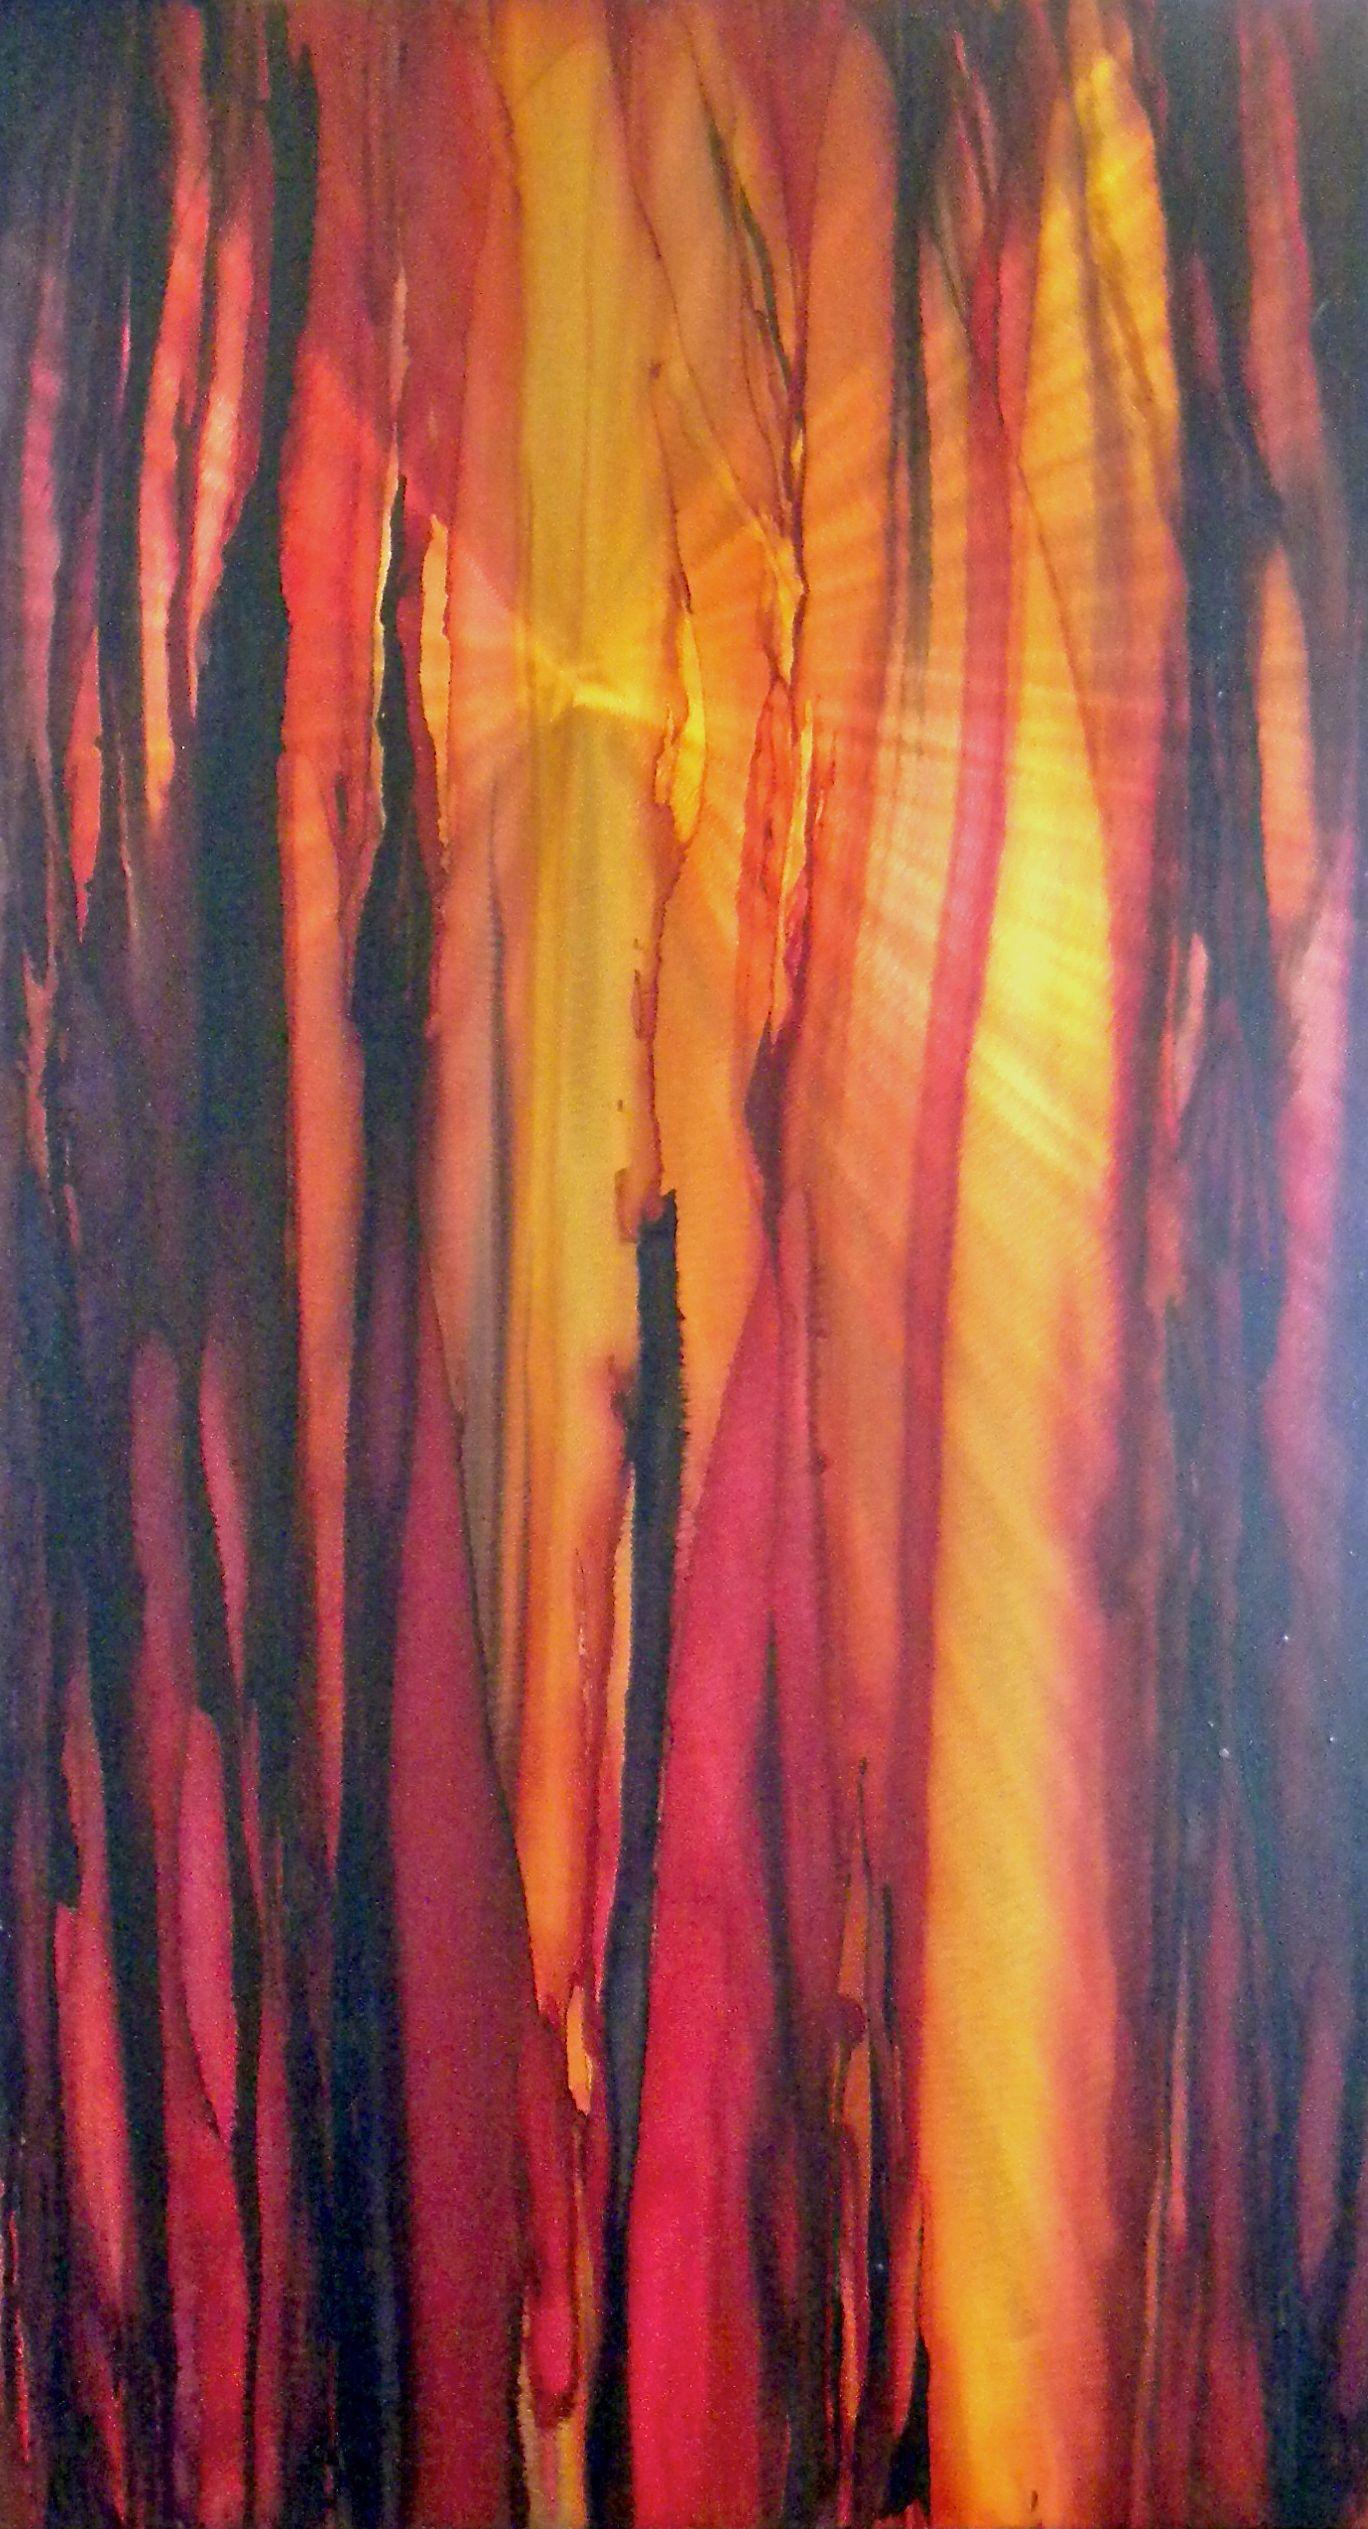 Kartchner 3 #243 by  Lynn Rae Lowe - Masterpiece Online